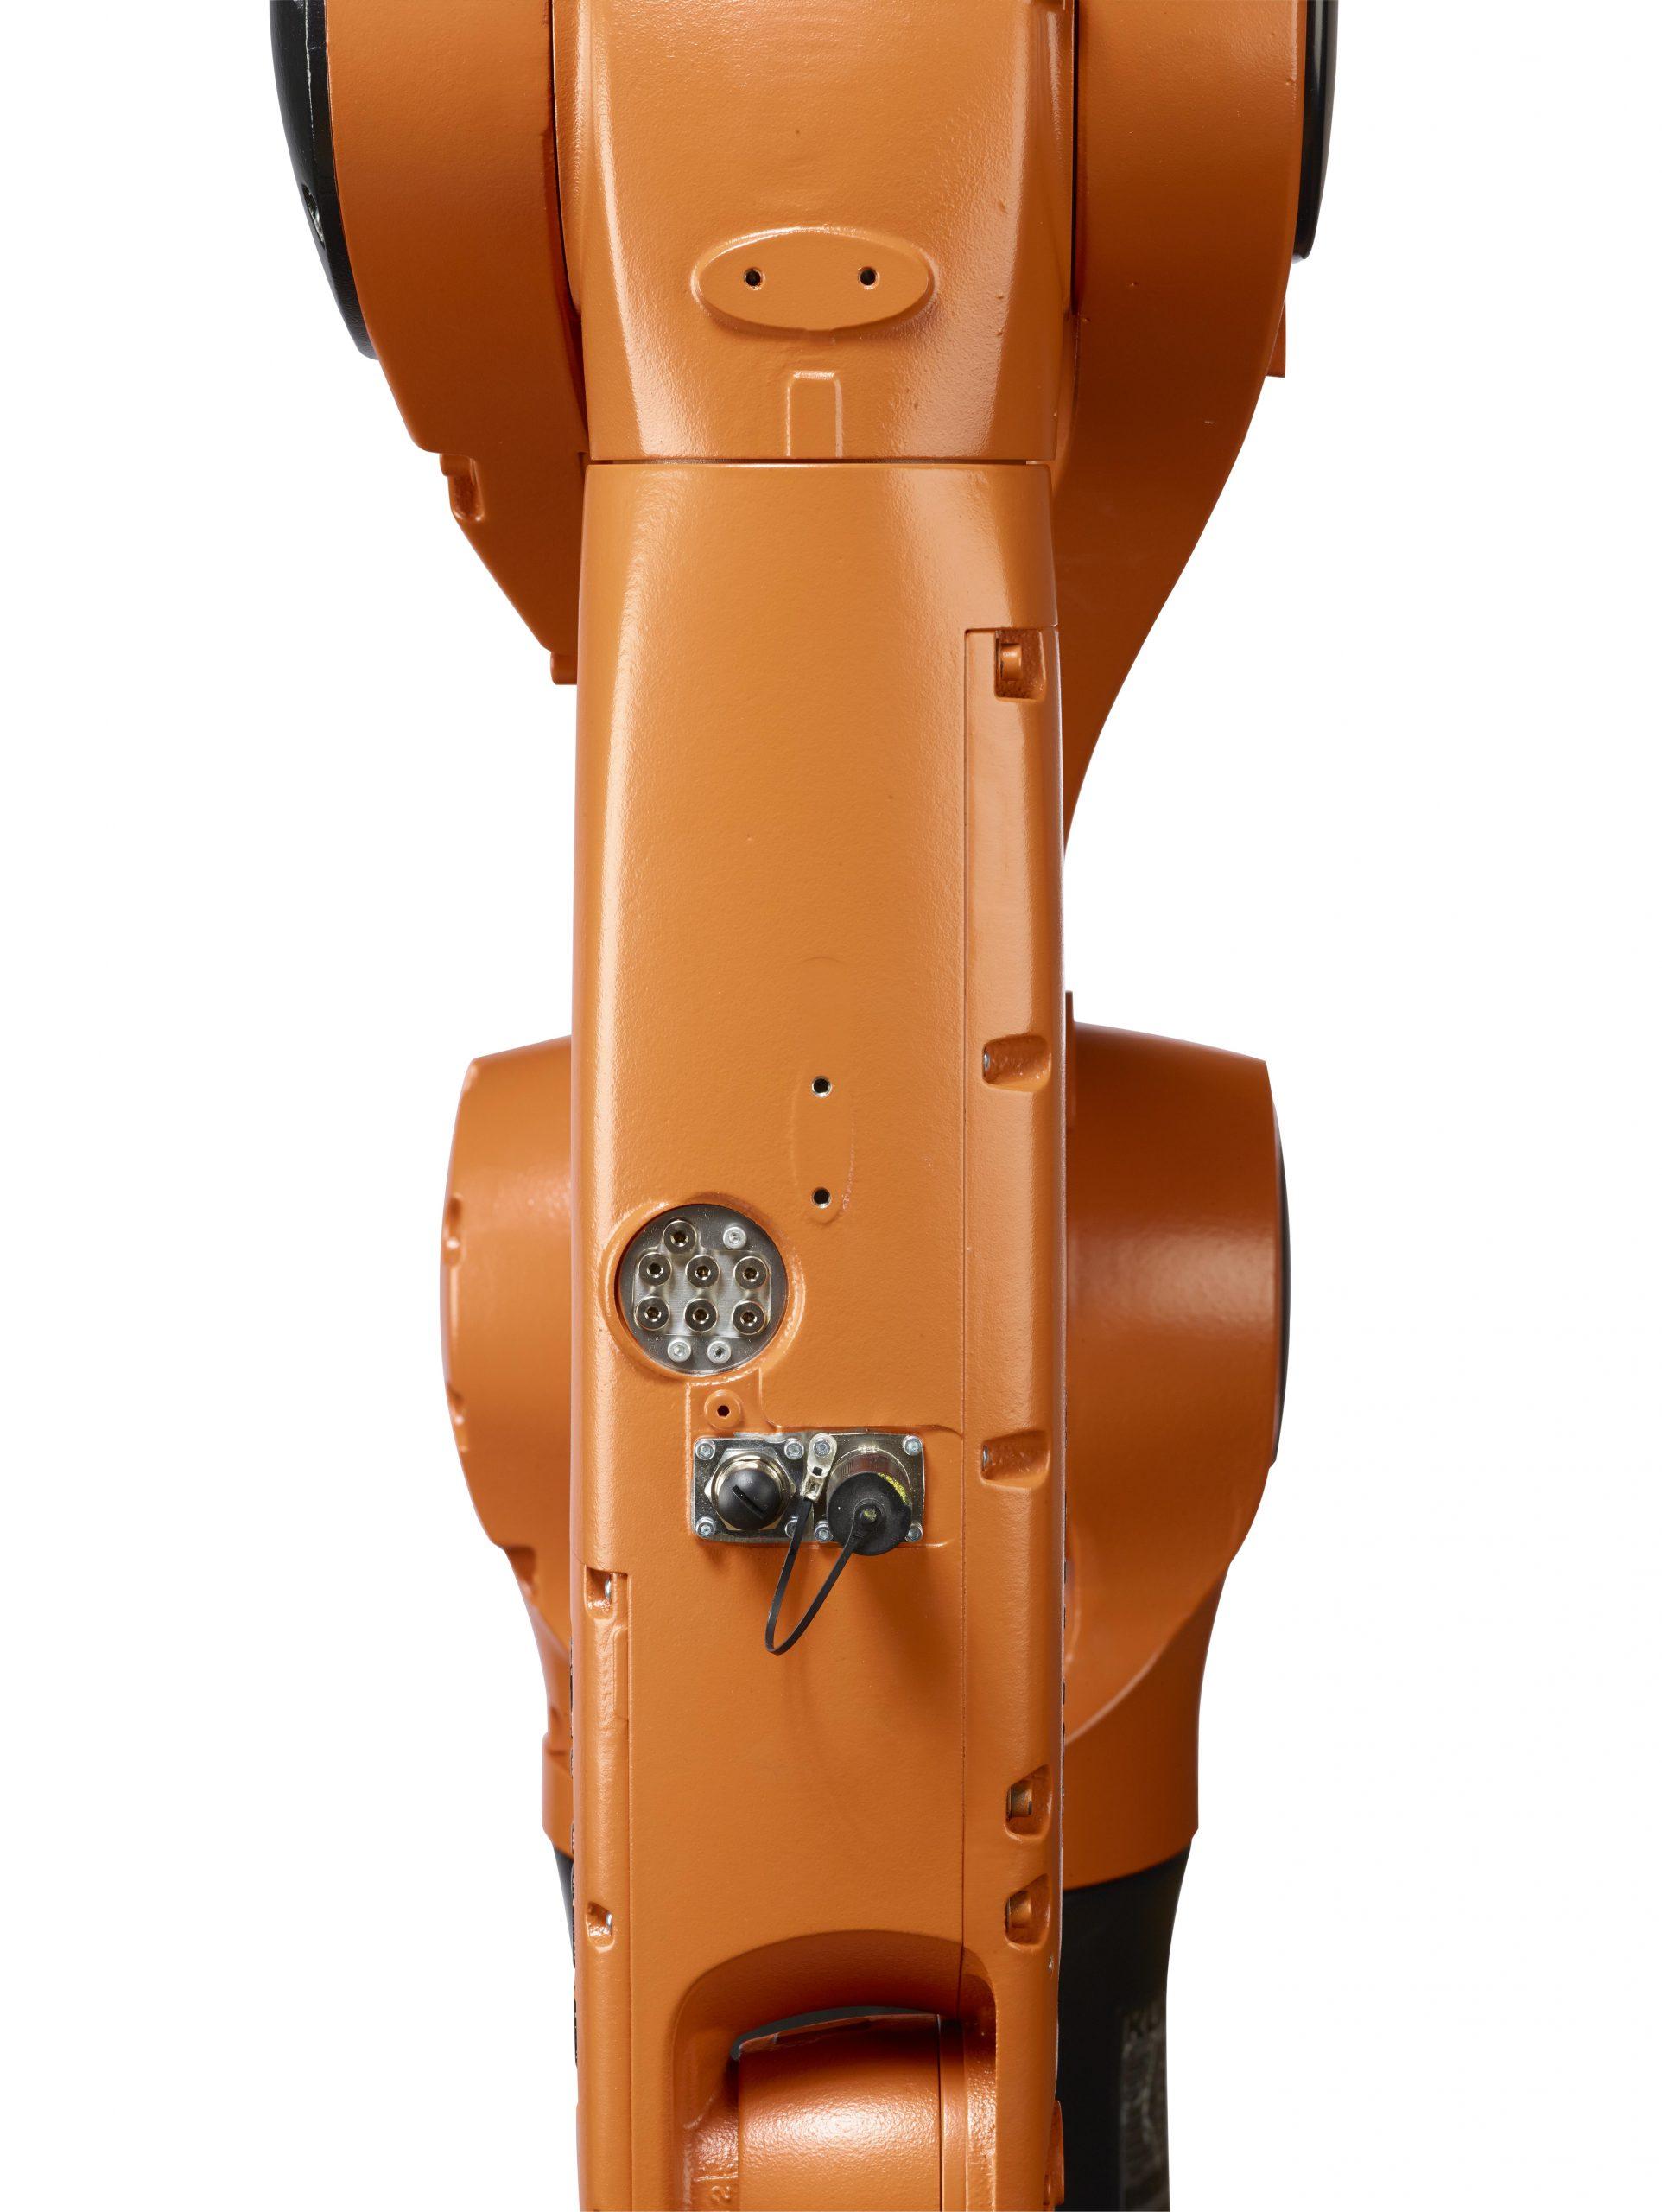 KUKA KR 6 R900 fivve (KR AGILUS)-8